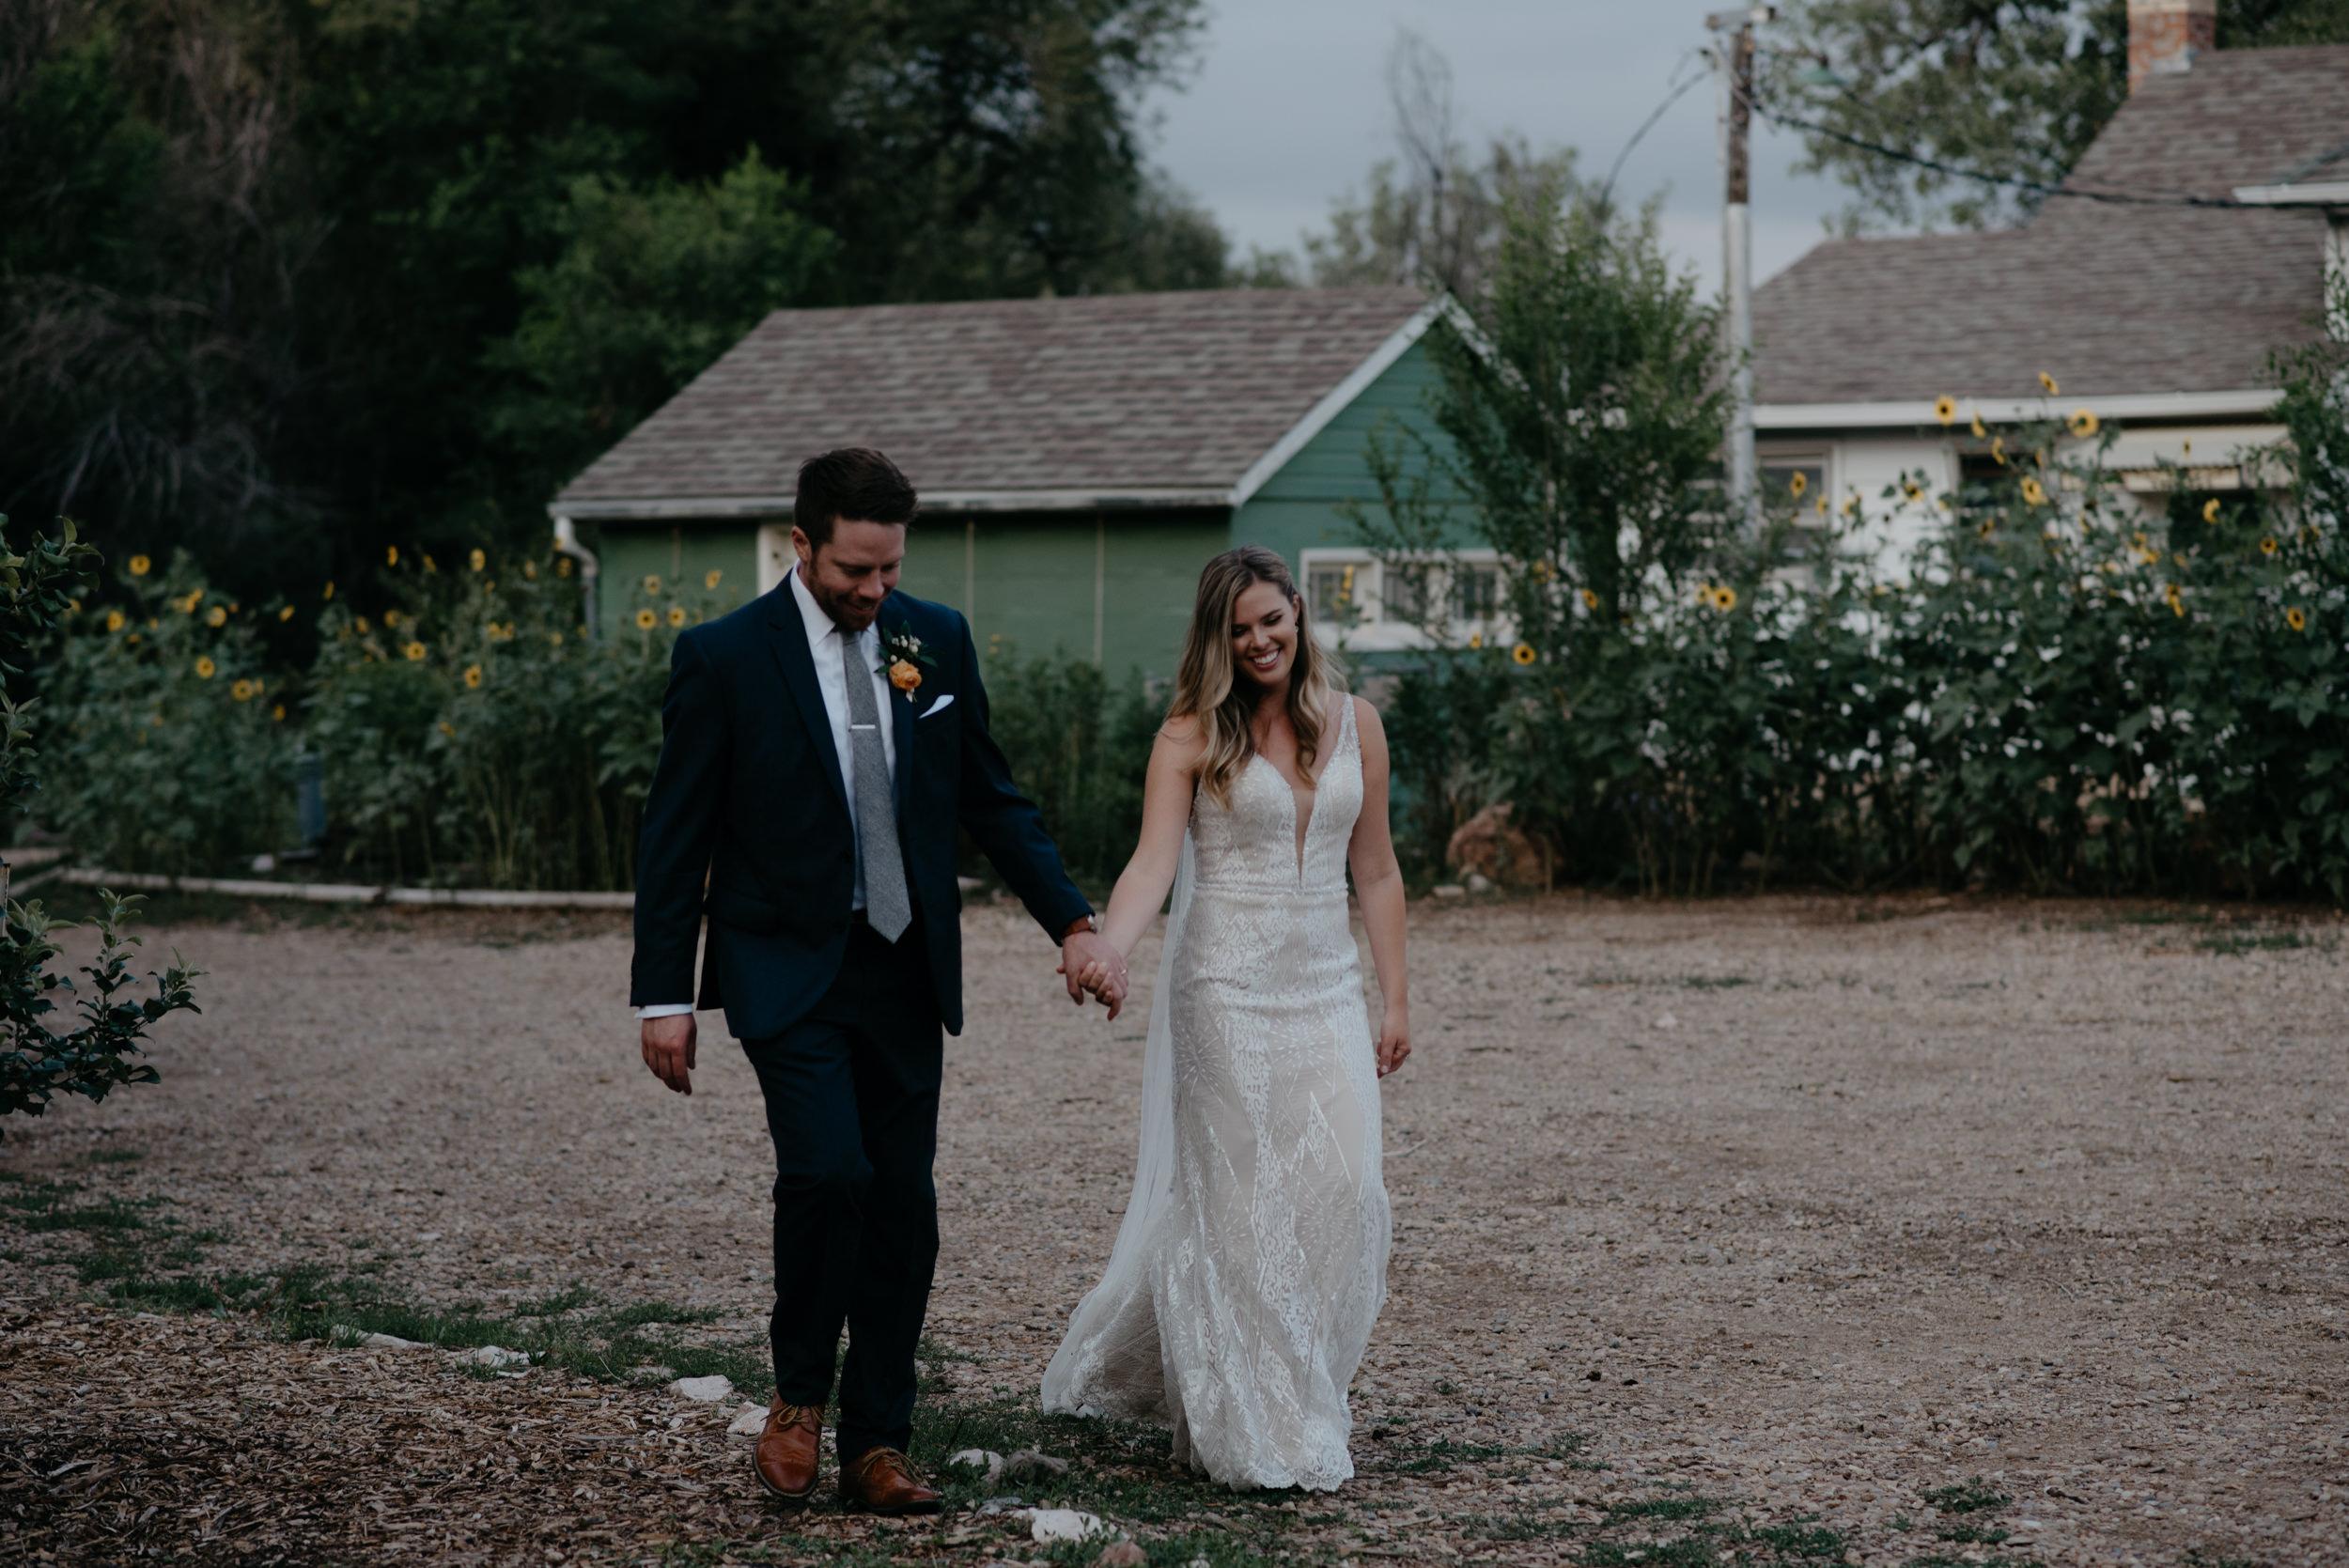 Bride and groom grand entrance. Boulder wedding photographer. Colorado wedding and elopement photographer. Rustic wedding in Boulder at Three Leaf Farm.